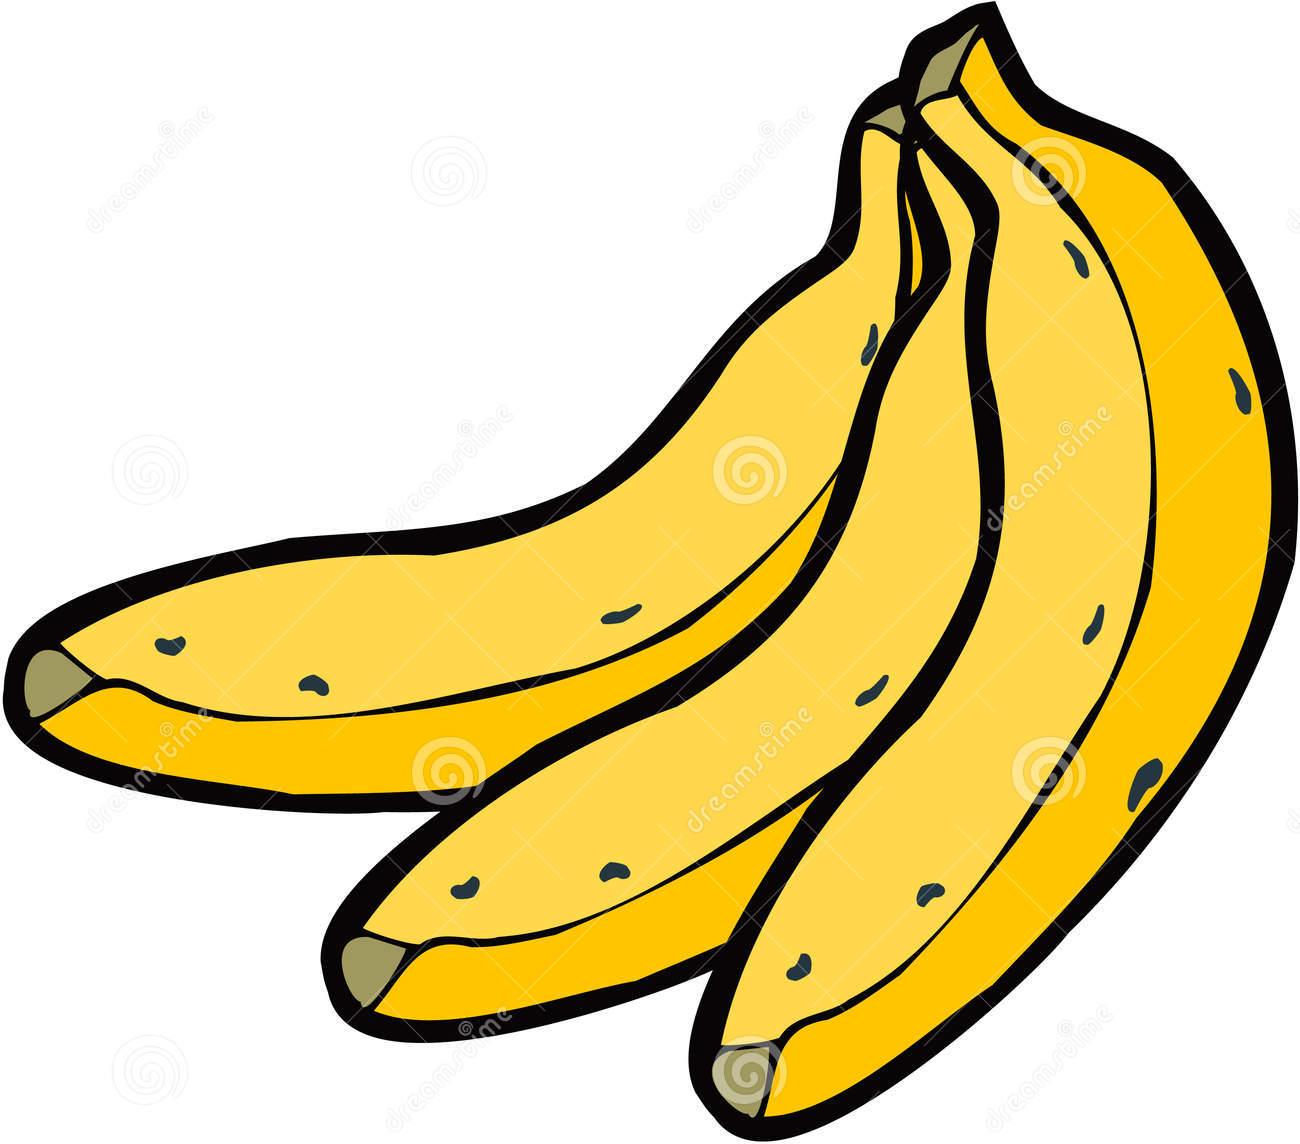 Banana Clip Art Black And White Banana Black And White clipart